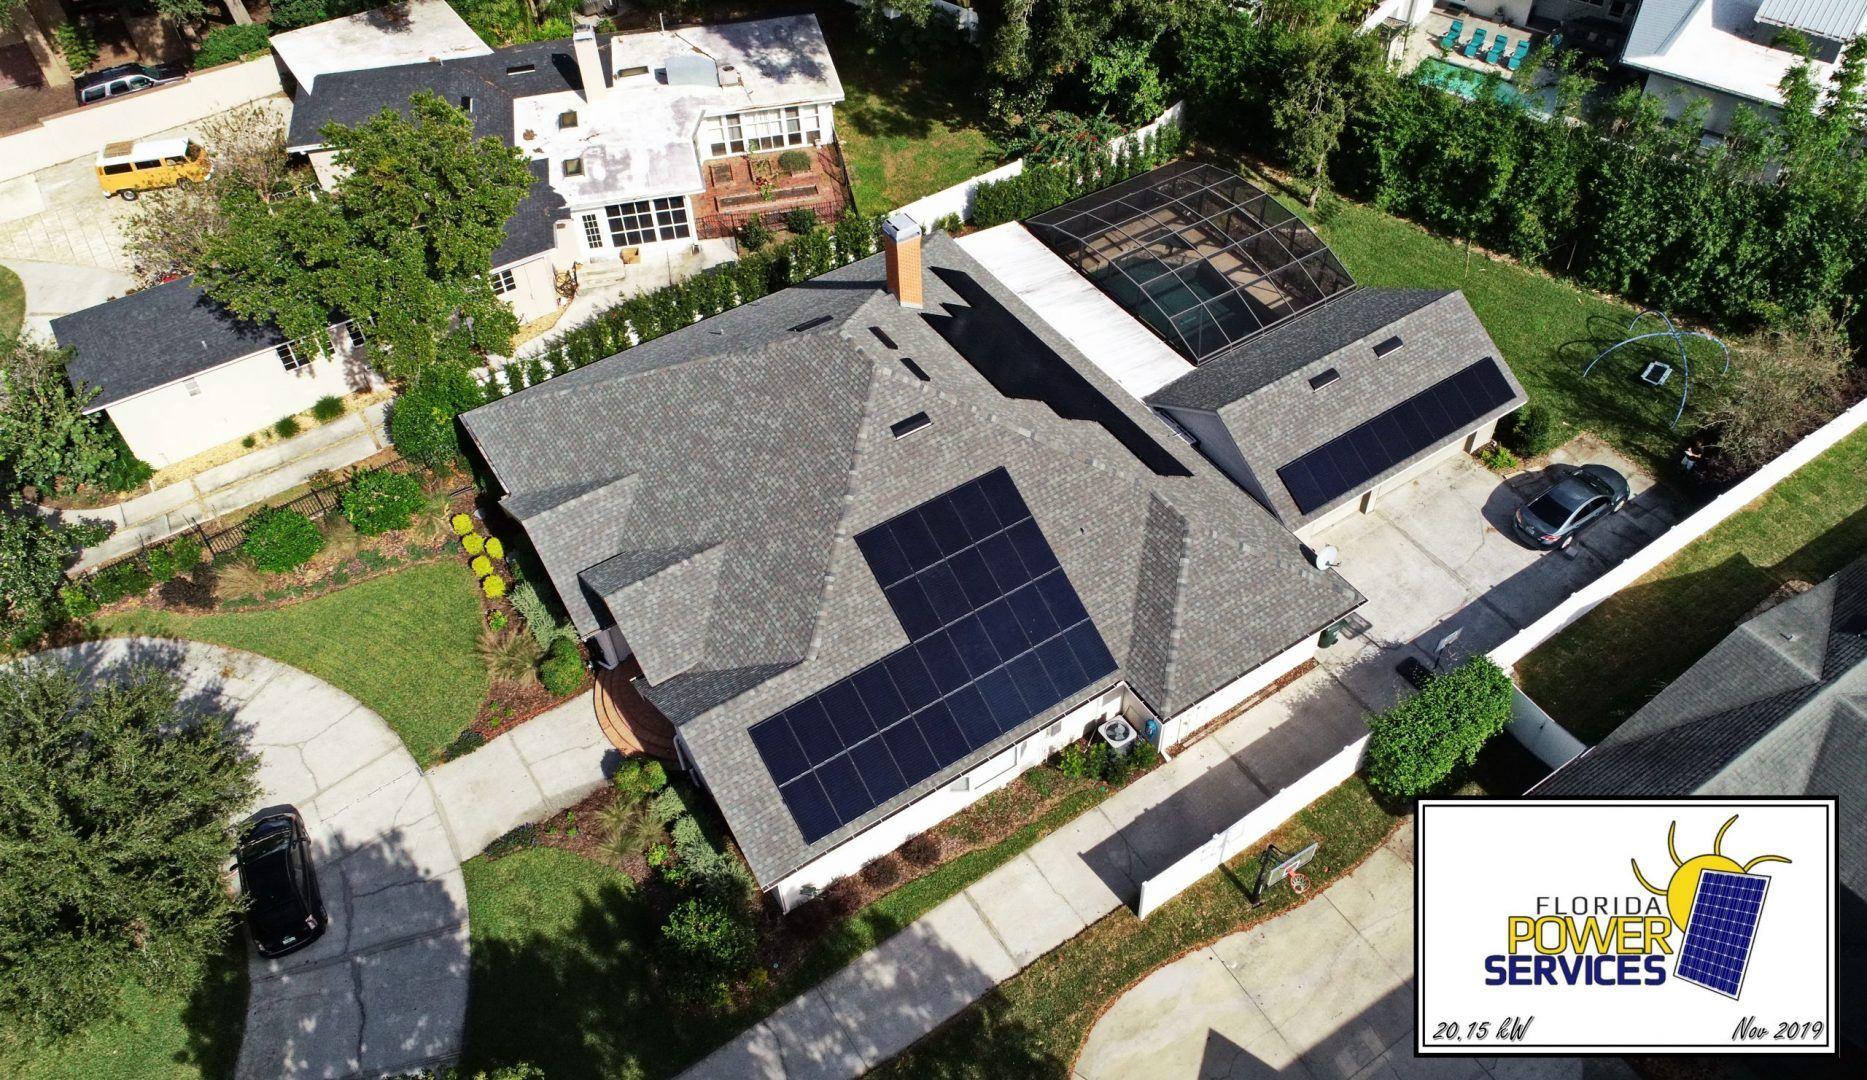 20.15 kW Lakeland Solar System